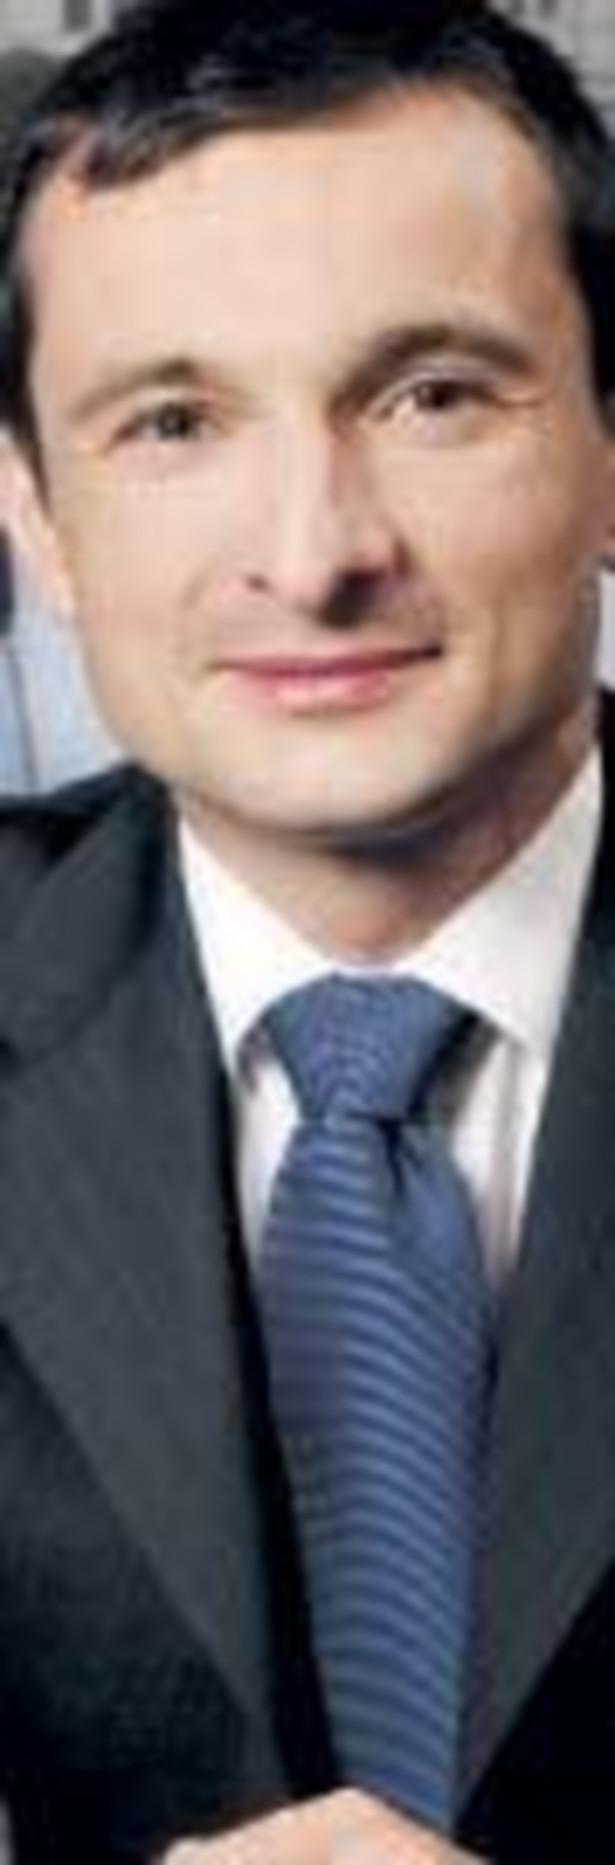 Mariusz Staniszewski, prezes Noble Funds TFI